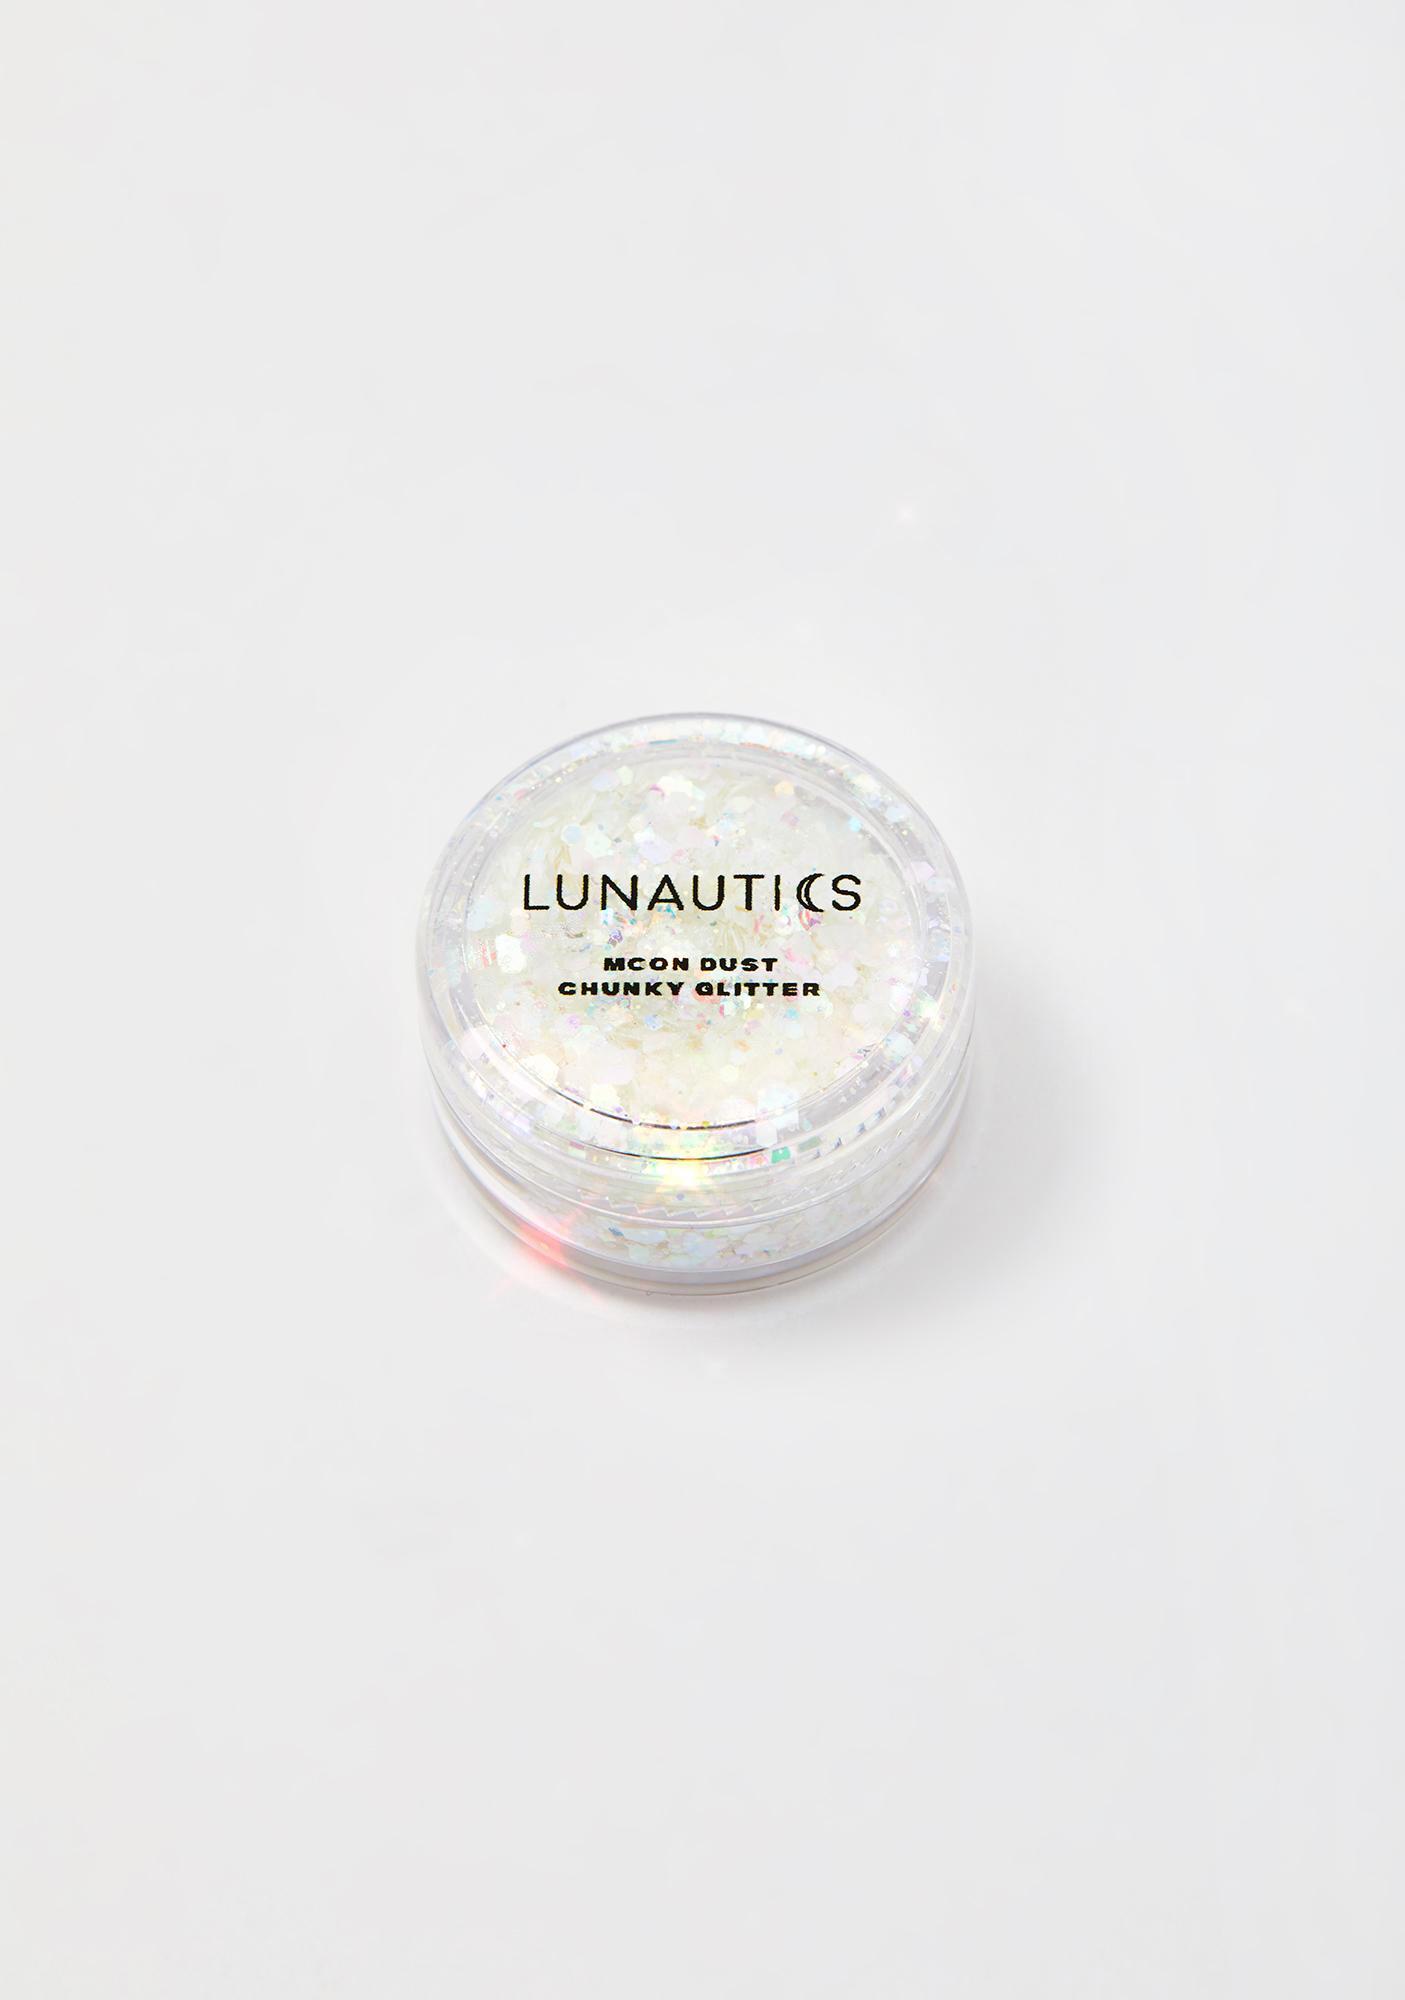 Lunautics Bday Cake Moon Dust Glitter